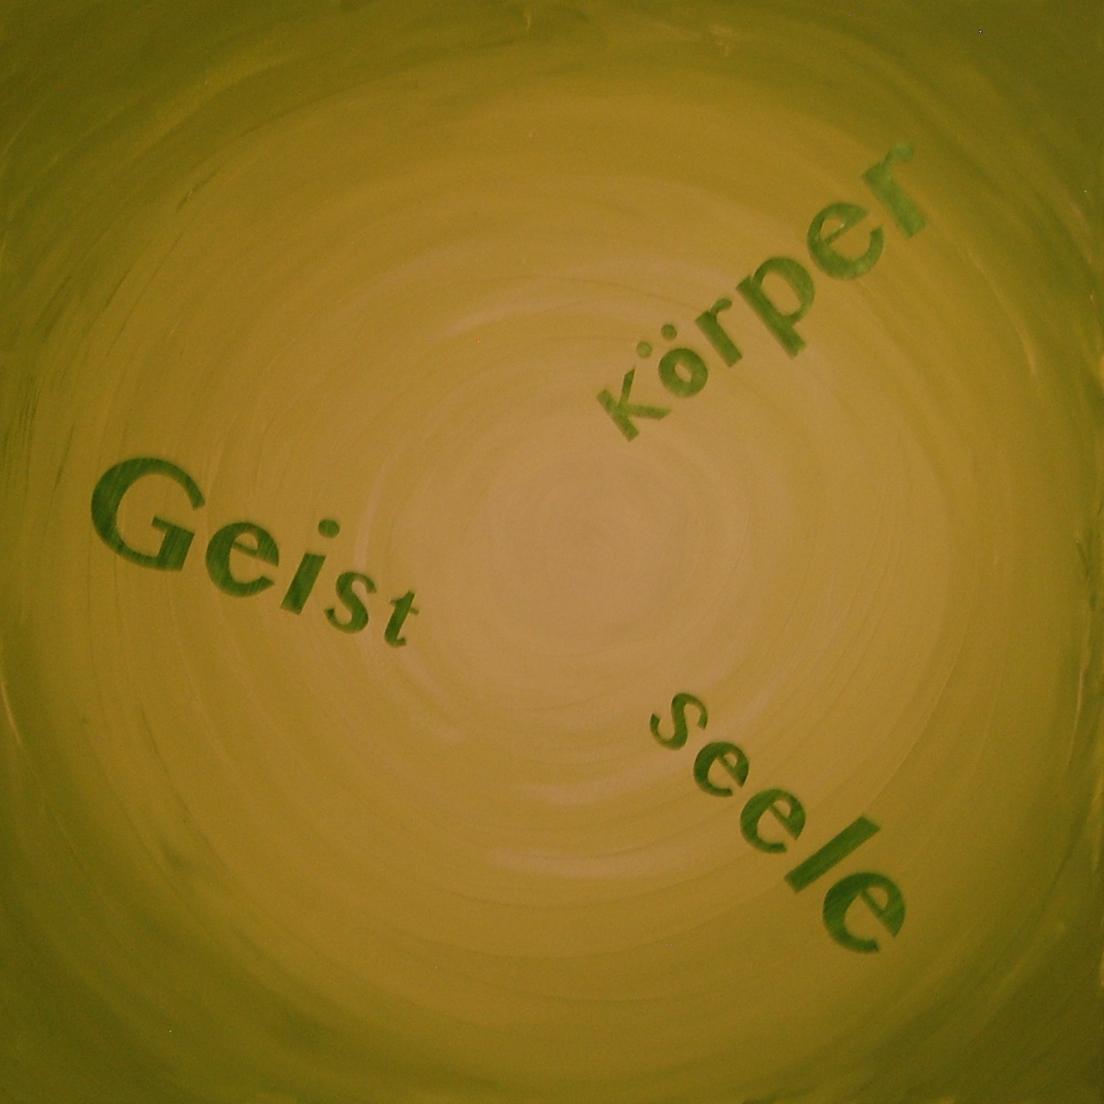 Körper-Seele-Geist_40_x_40_cm